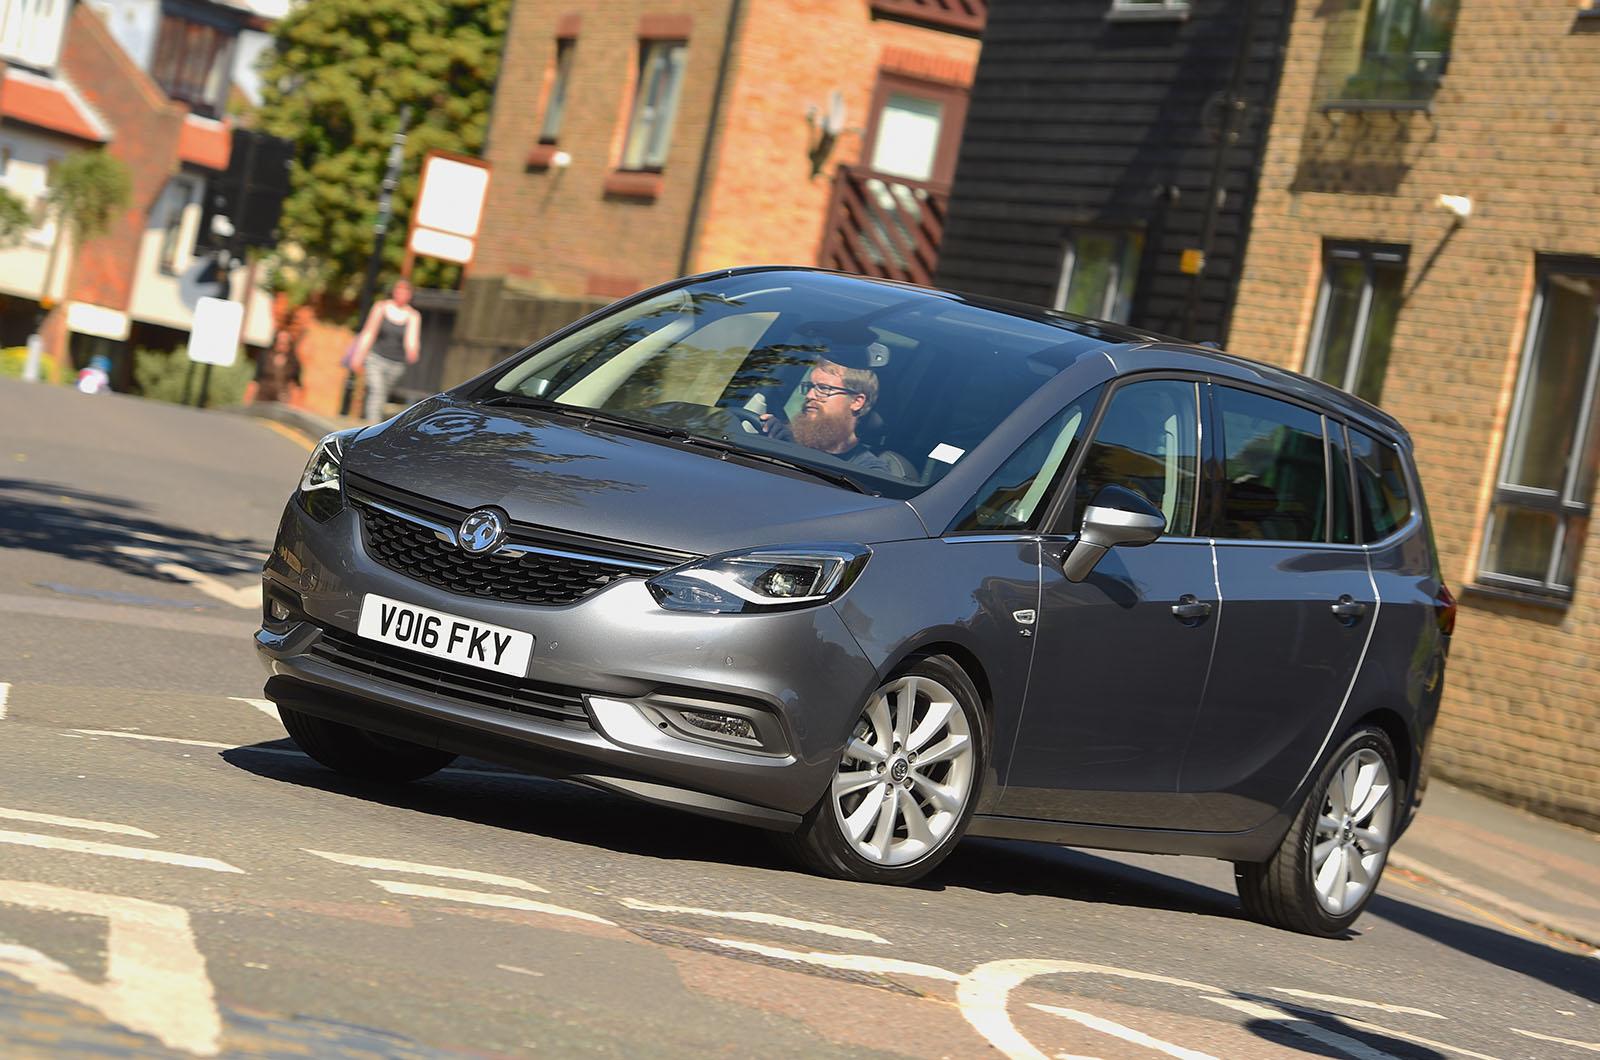 Vauxhall Corsa Review Autocar Autocar First For Car .html ... - photo#29